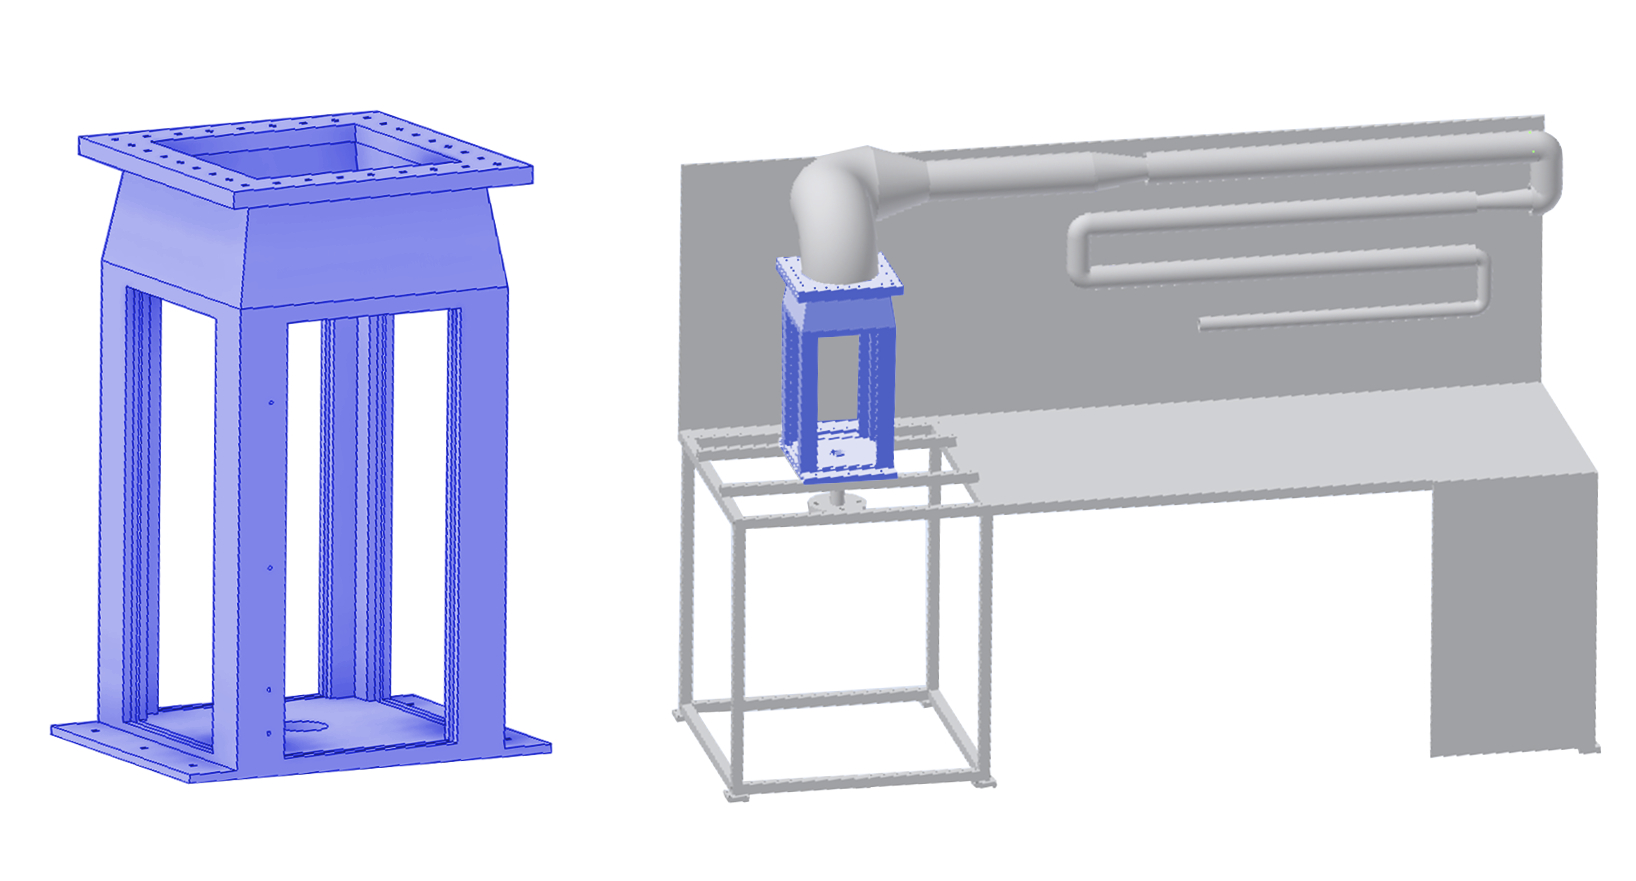 Oxy-fuel burner (design)